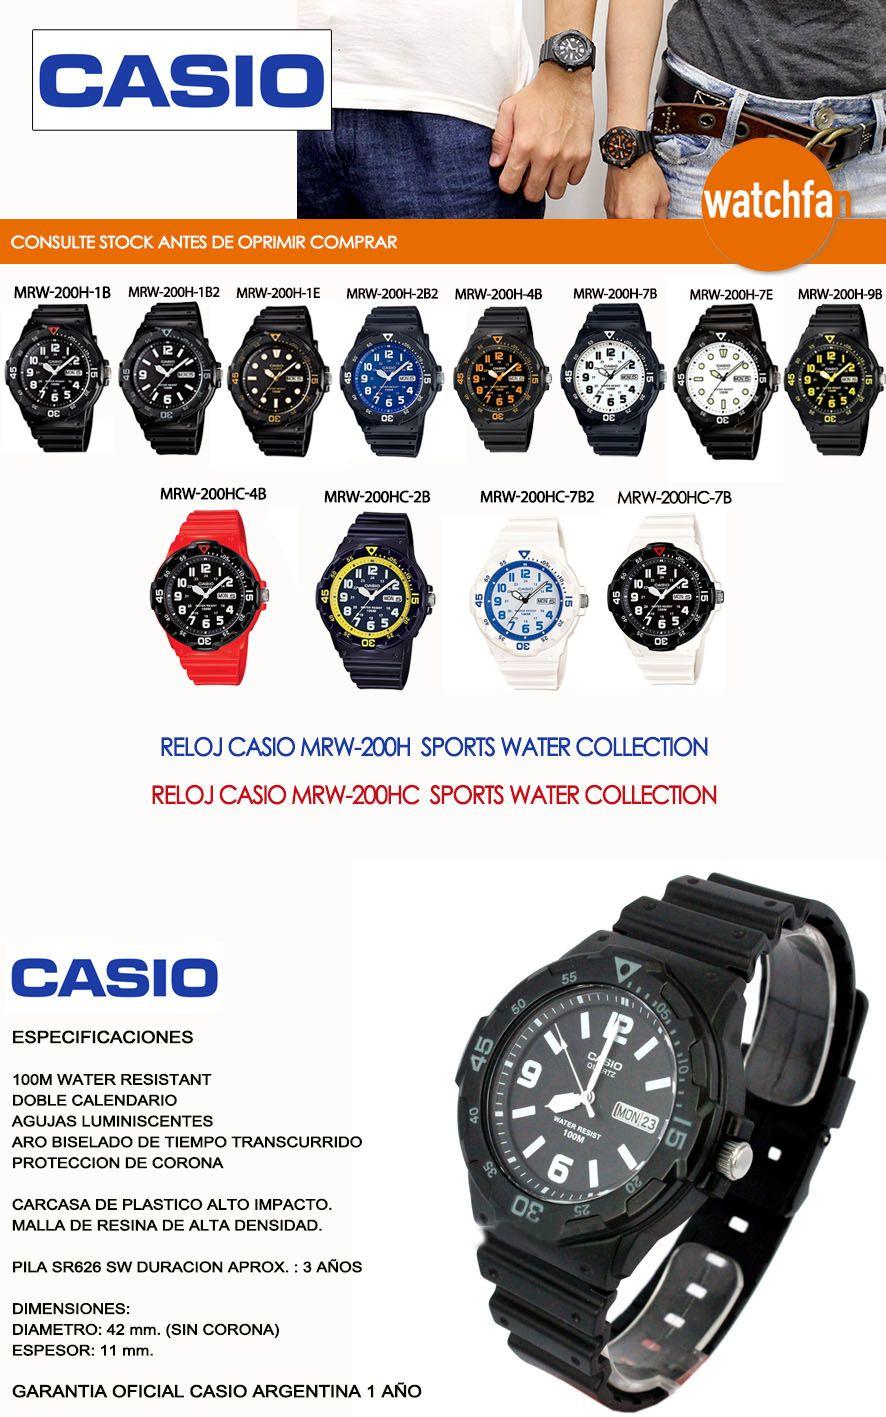 458ee6c2564a Pin de Lau en Relojes Casio